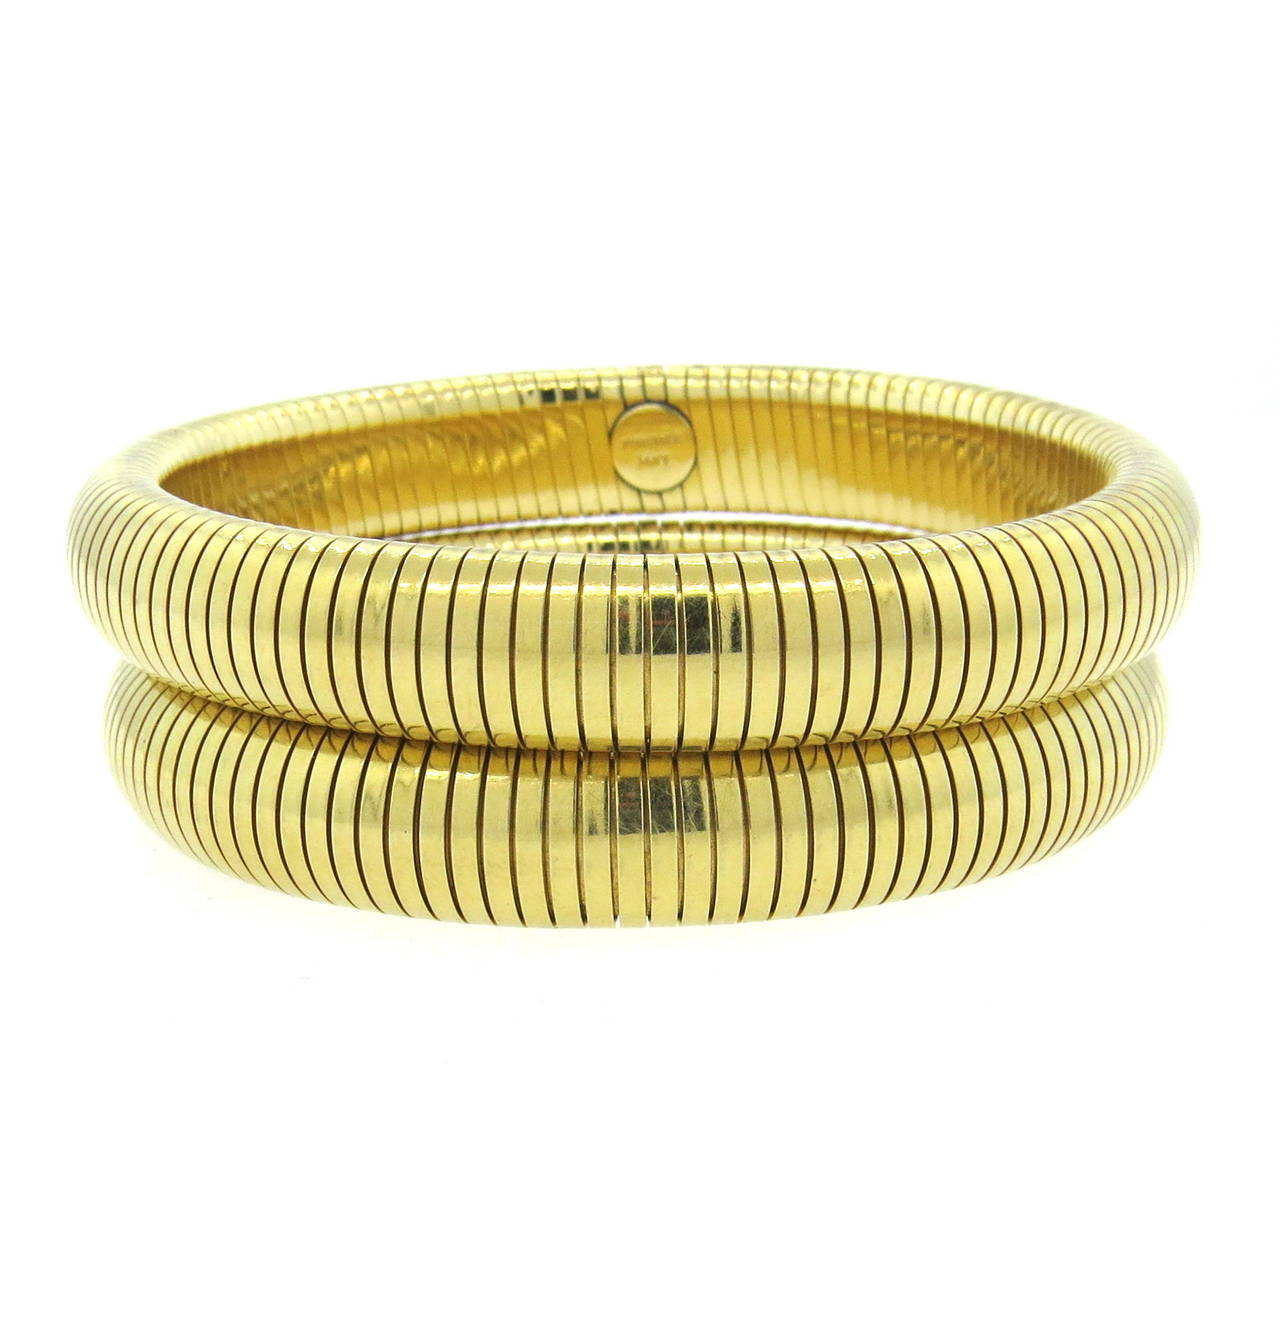 Circa 1940s Forstner 14k Gold Bracelet Set Each Bangle Will Fit Up To 7